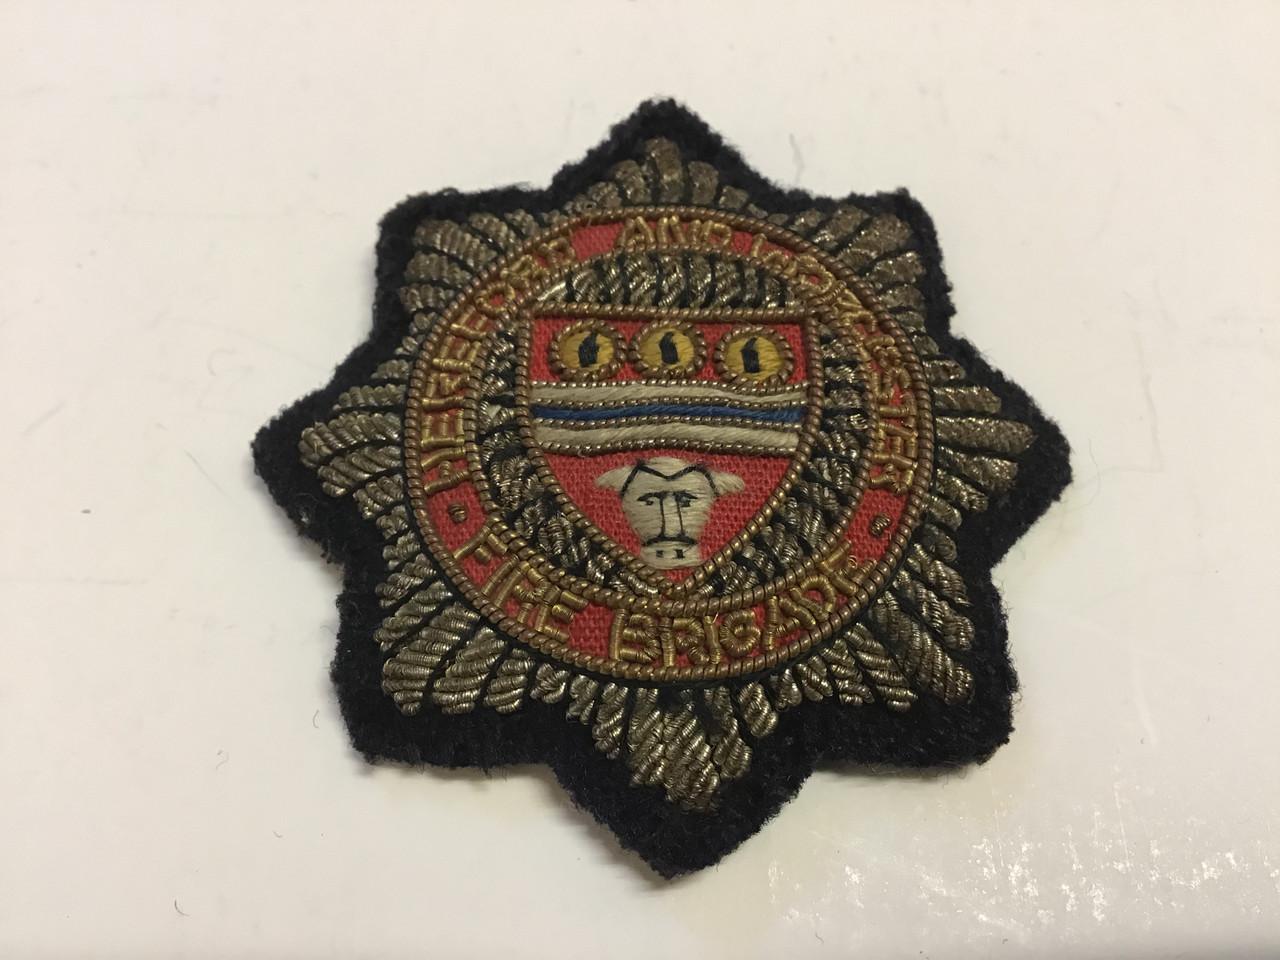 GD 571 HEREFORD & WORCESTER FIRE BRIGADE SENIOR OFFICER CAP BADGE.